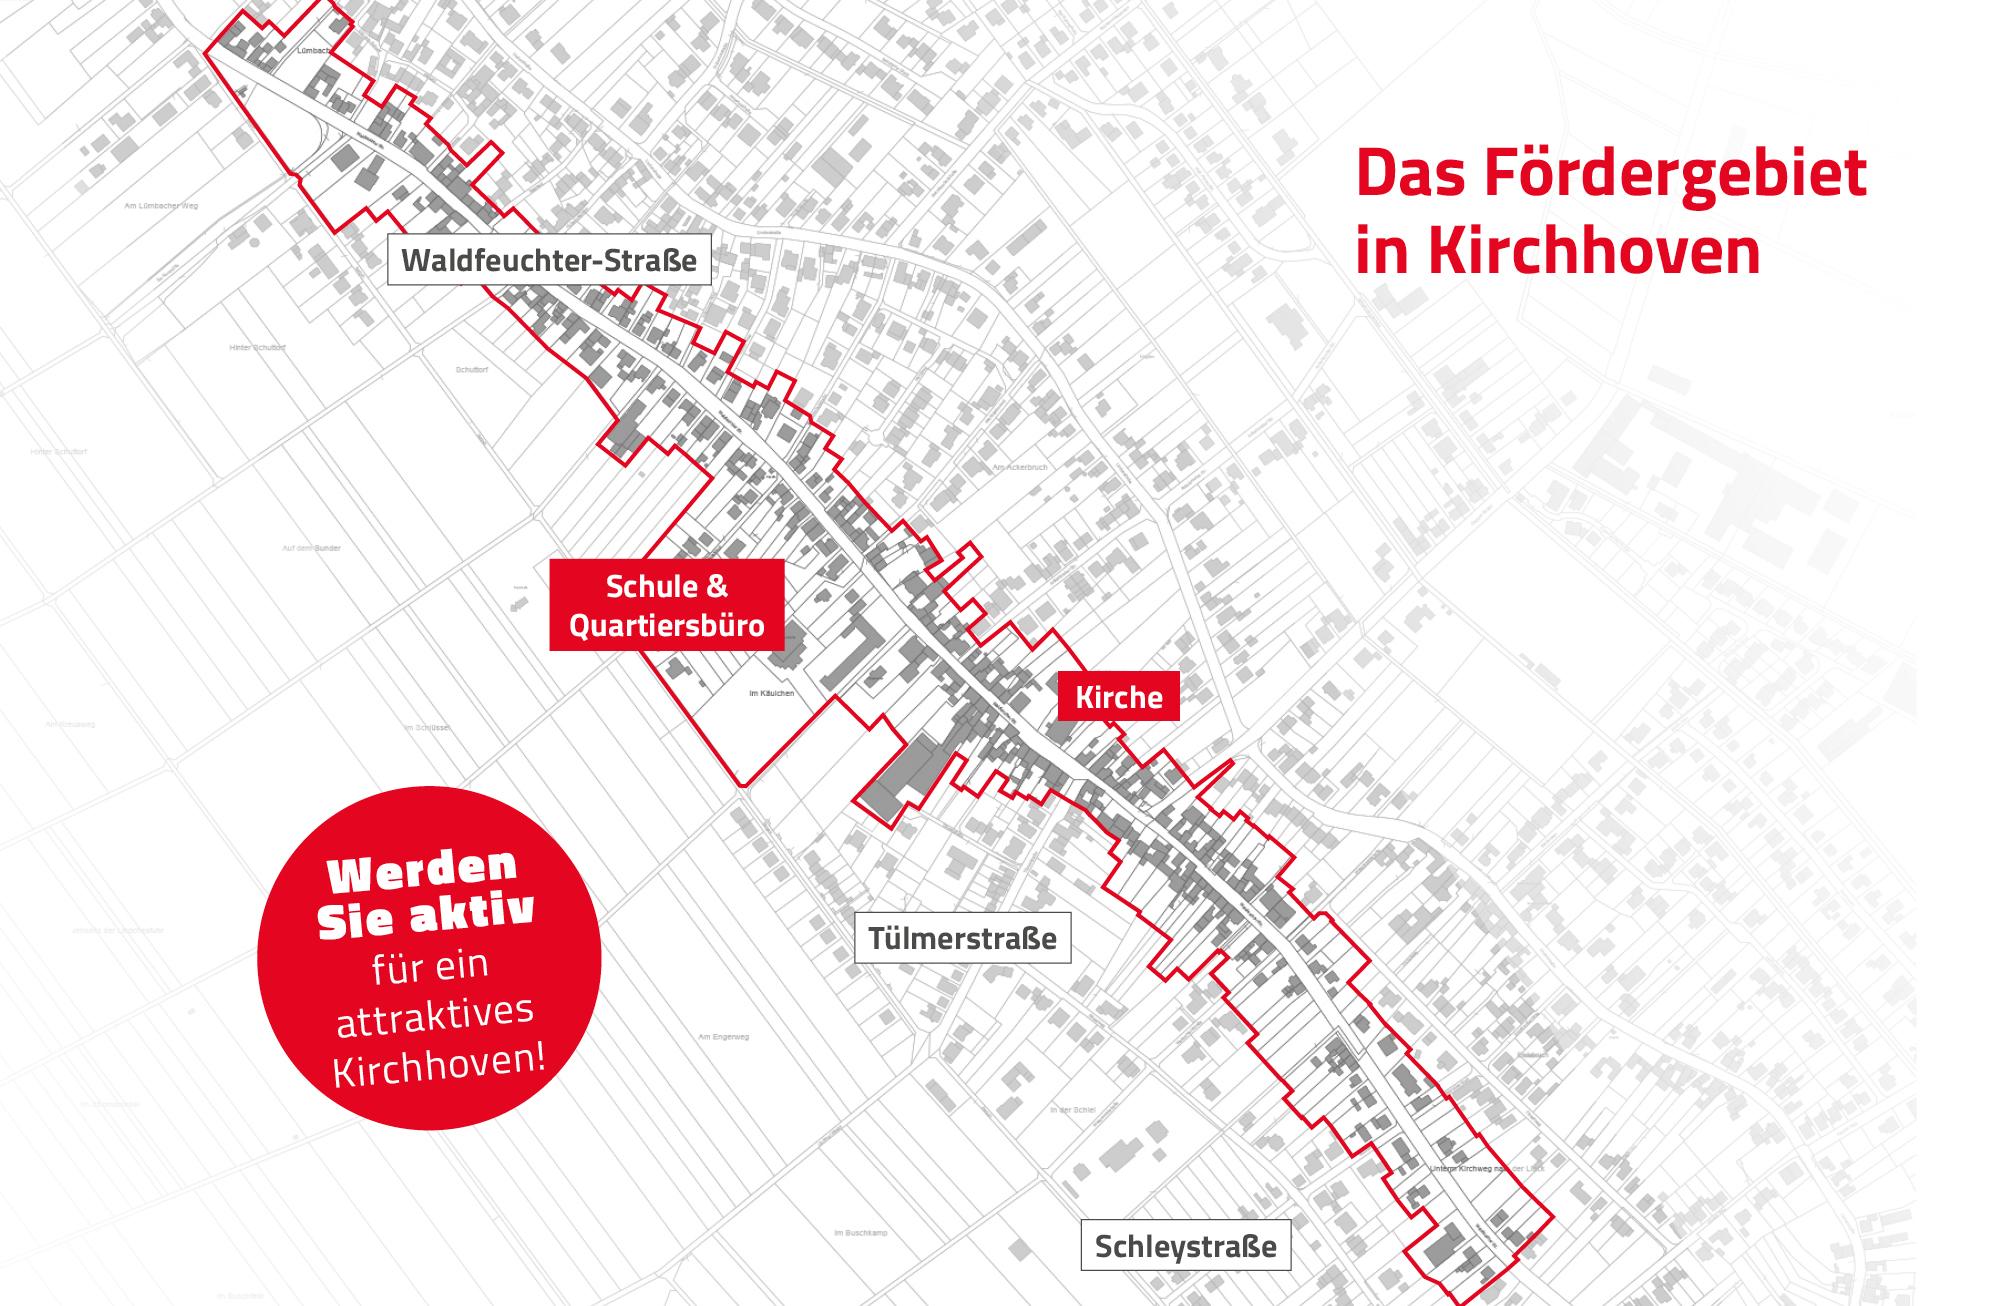 Kirchhoven